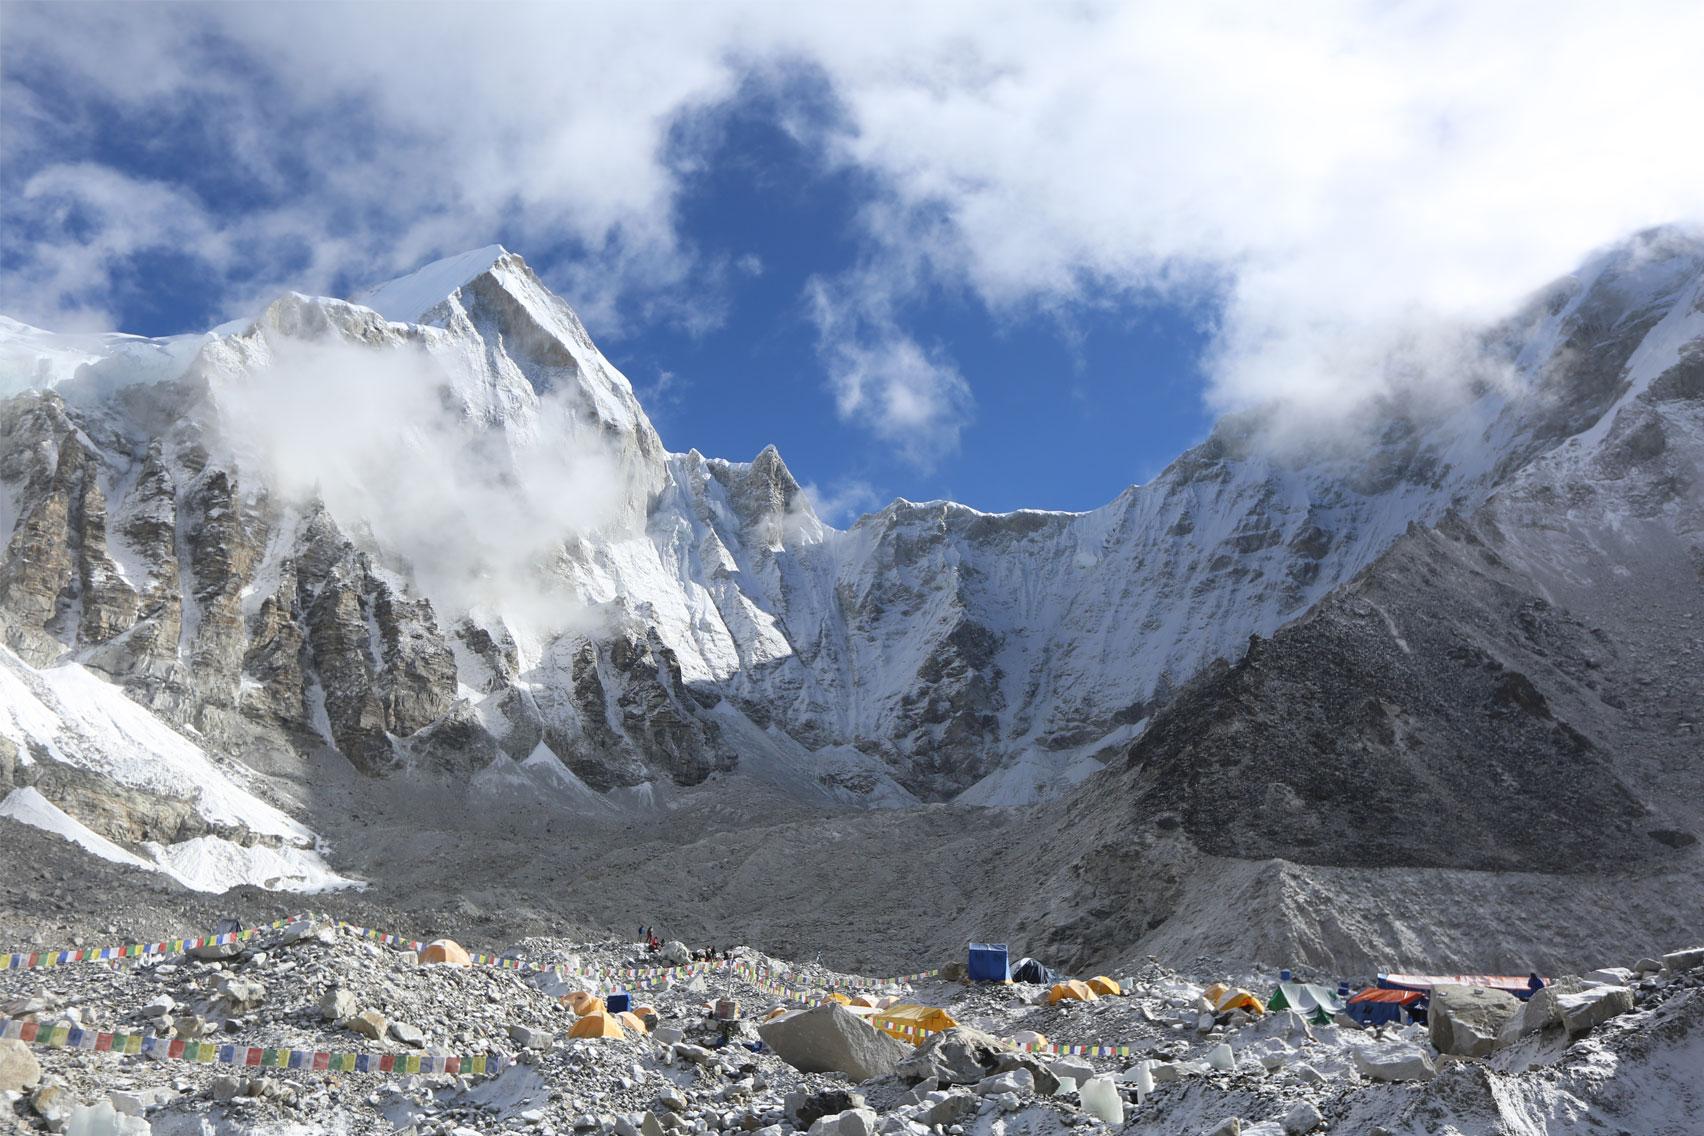 Day 10: Trek from Lobuche (4980m) to Everest Base Camp (5360m) and onto Gorakhshep (8hrs, 5164m)